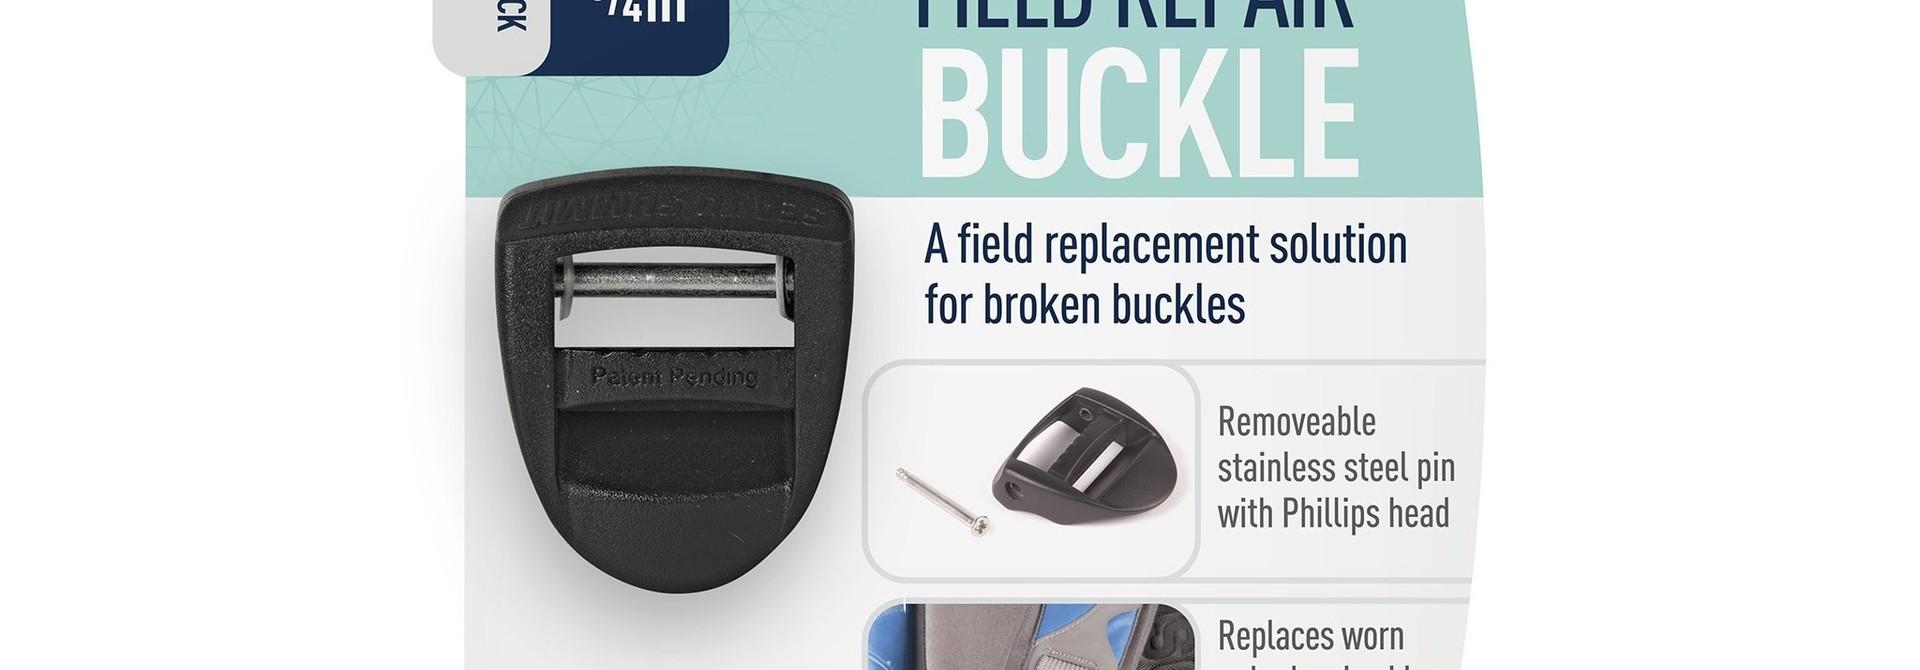 "Field Repair Buckle 20mm / 3/4"" Ladderlock 1 Pin"